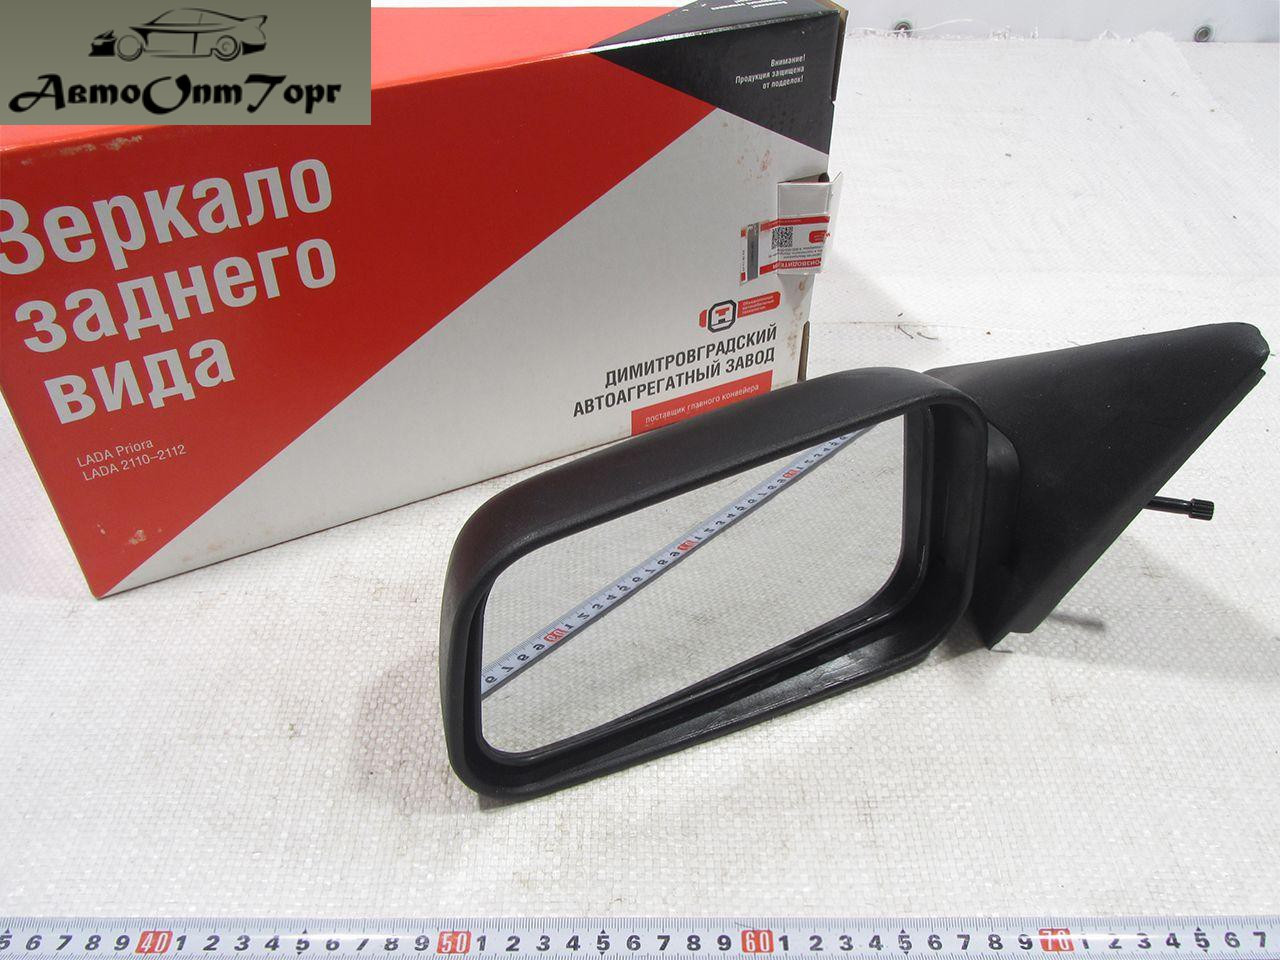 Зеркало боковое левое ВАЗ 2110,2111,2112 произ-во Дааз, кат.код. 2110-8201251;